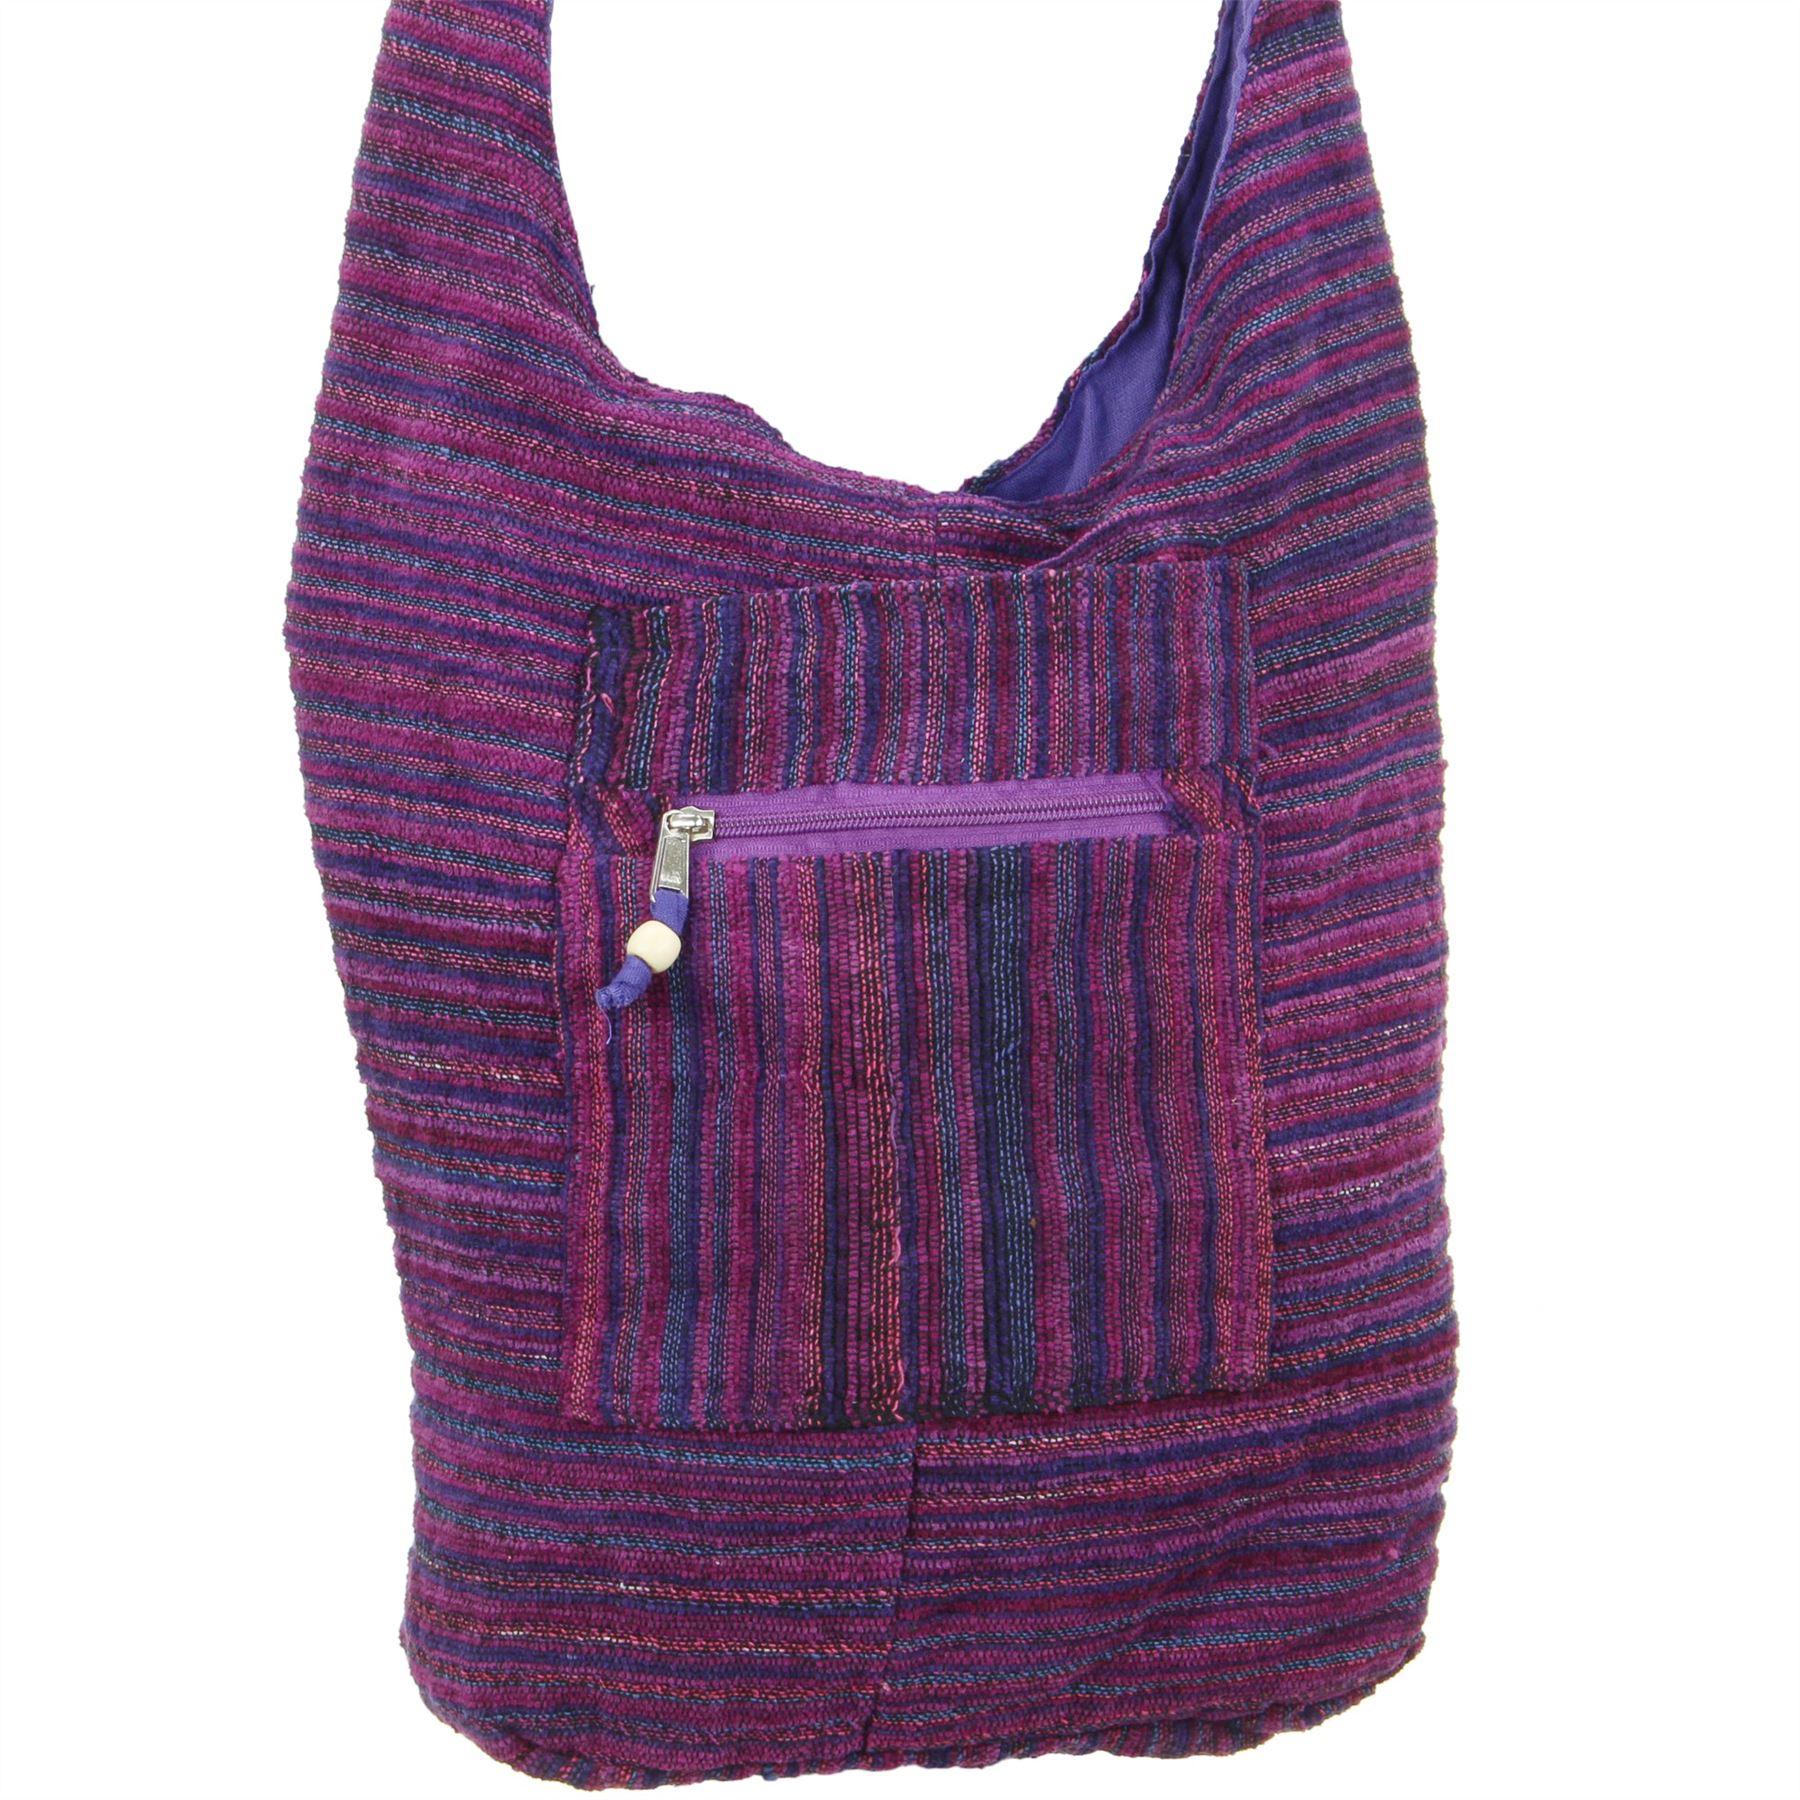 Sling-Bag-Chenille-Messenger-bandolera-cuerpo-transversal-Bolso-de-Mano-Bolso-Mochila-HOBO-HIPPIE miniatura 5